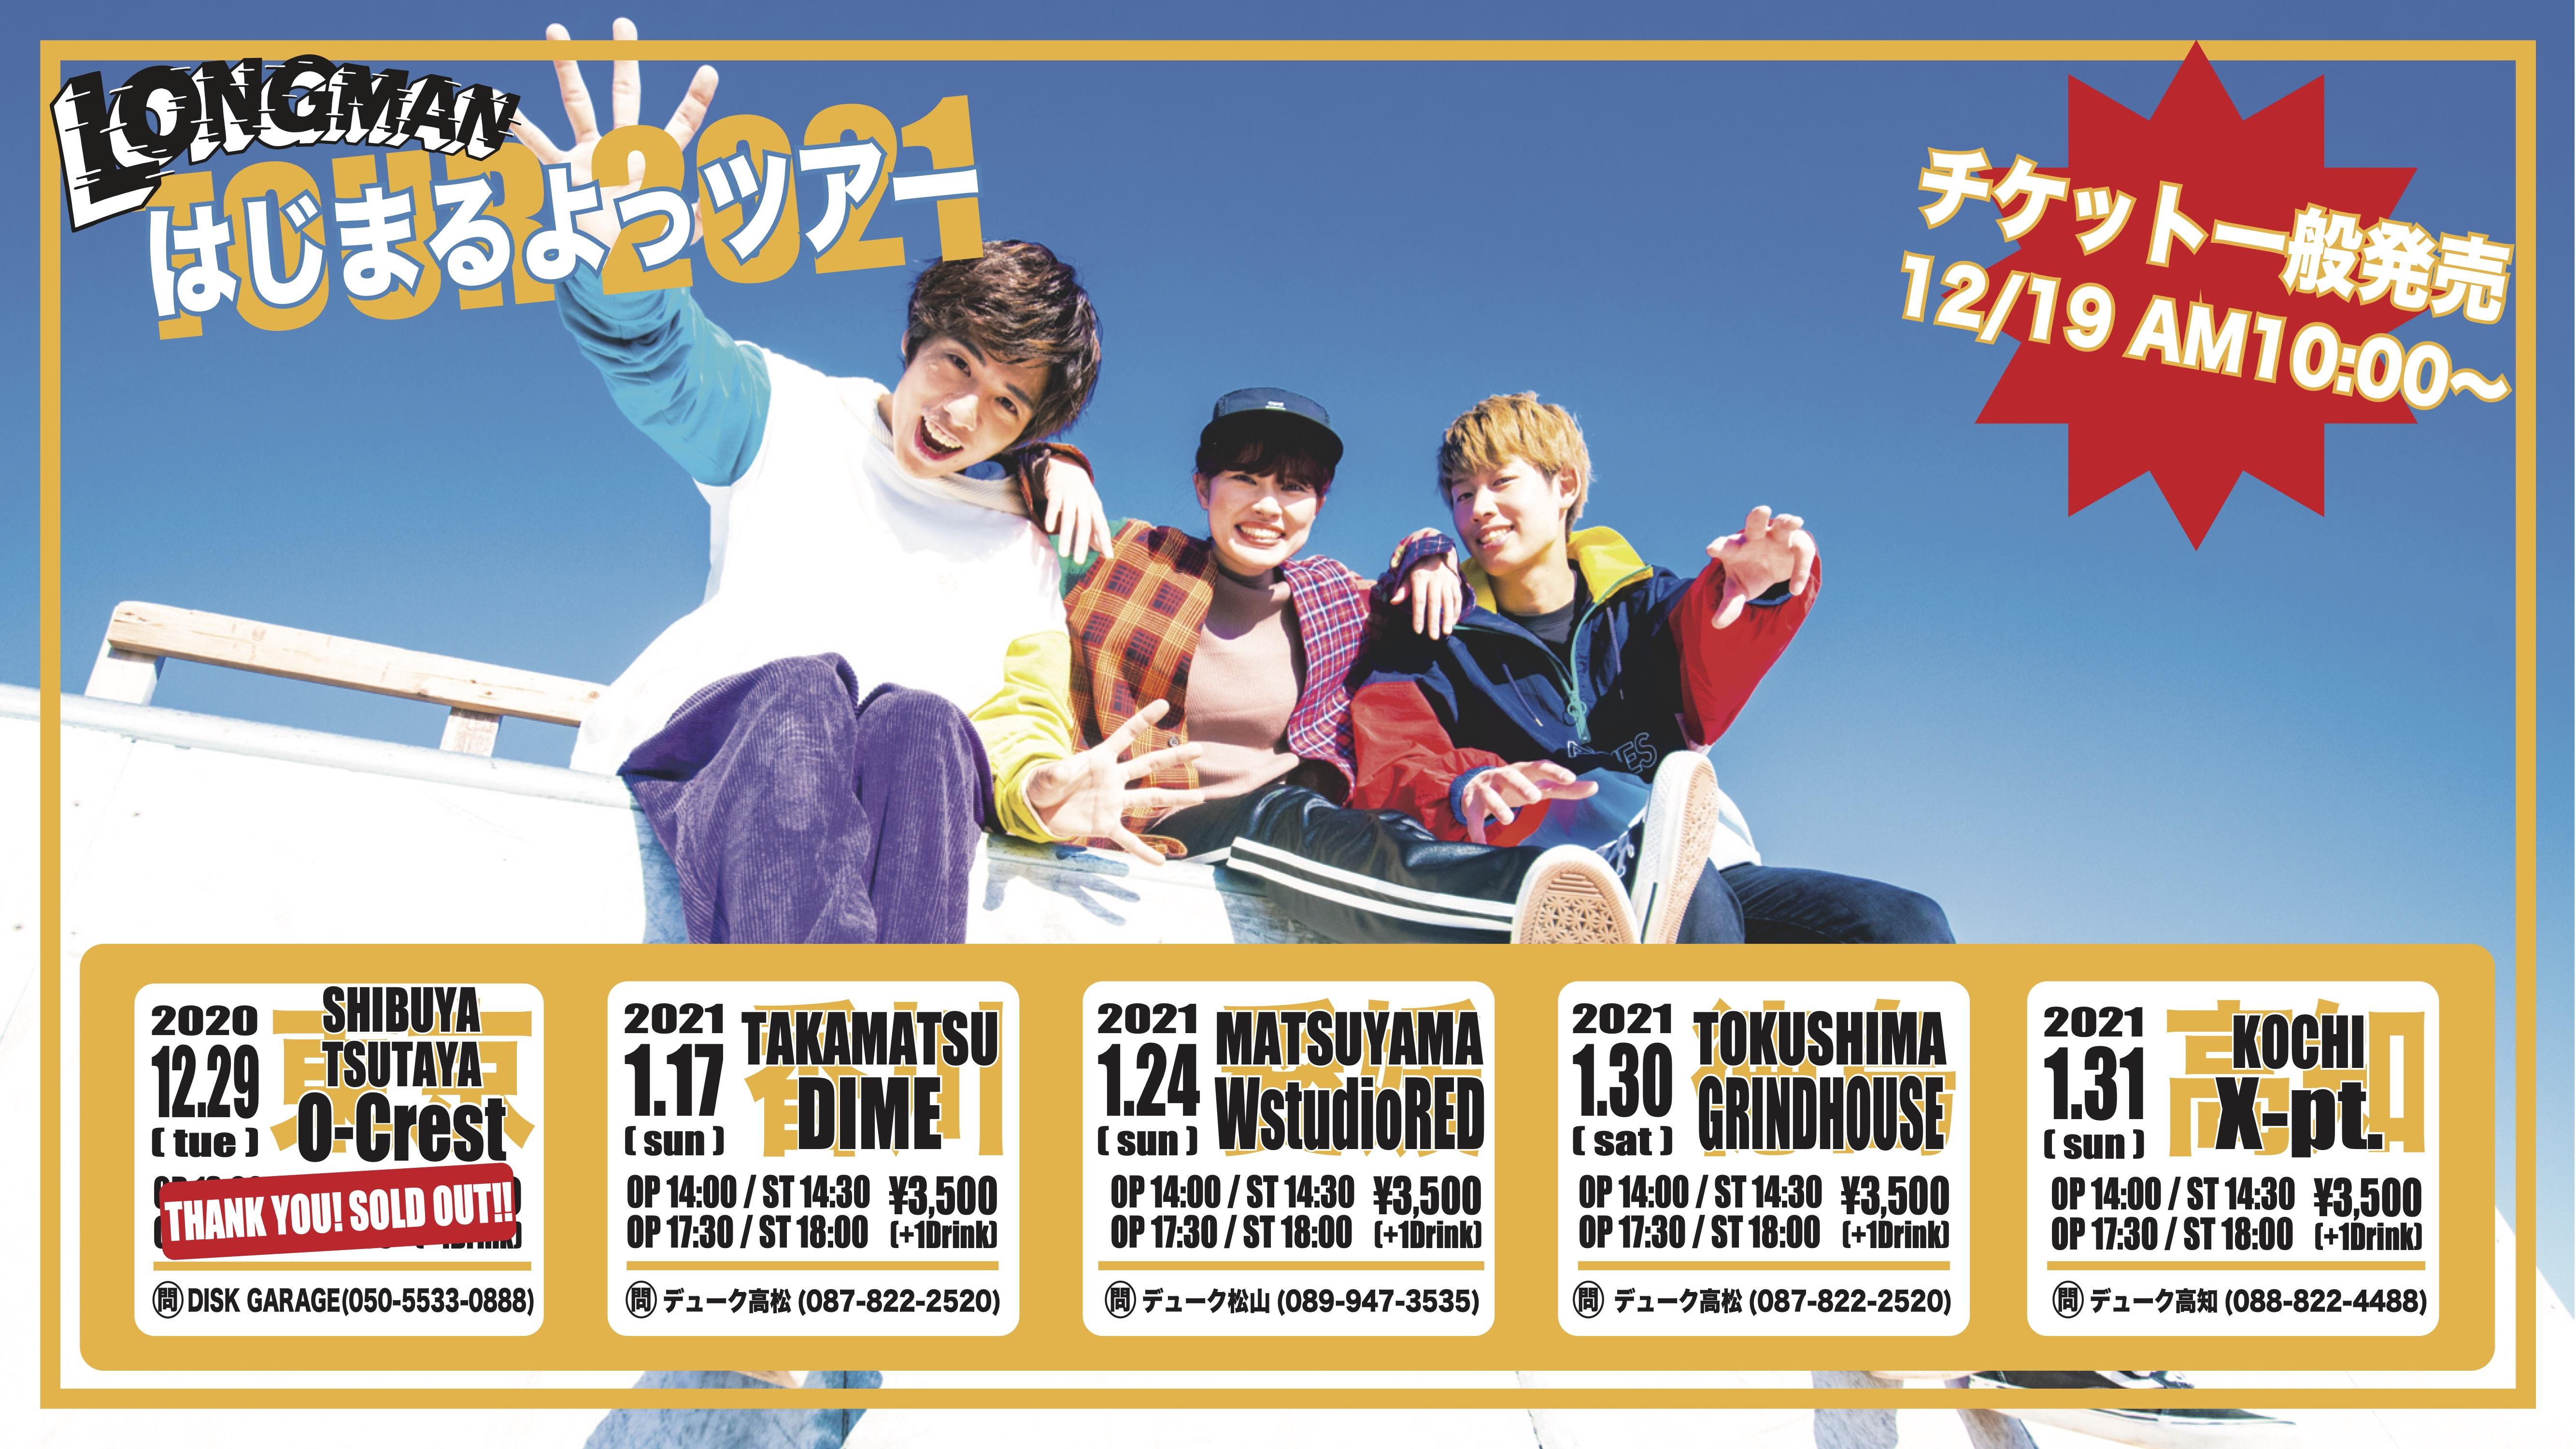 「LONGMANはじまるよっツアー」チケット発売中!